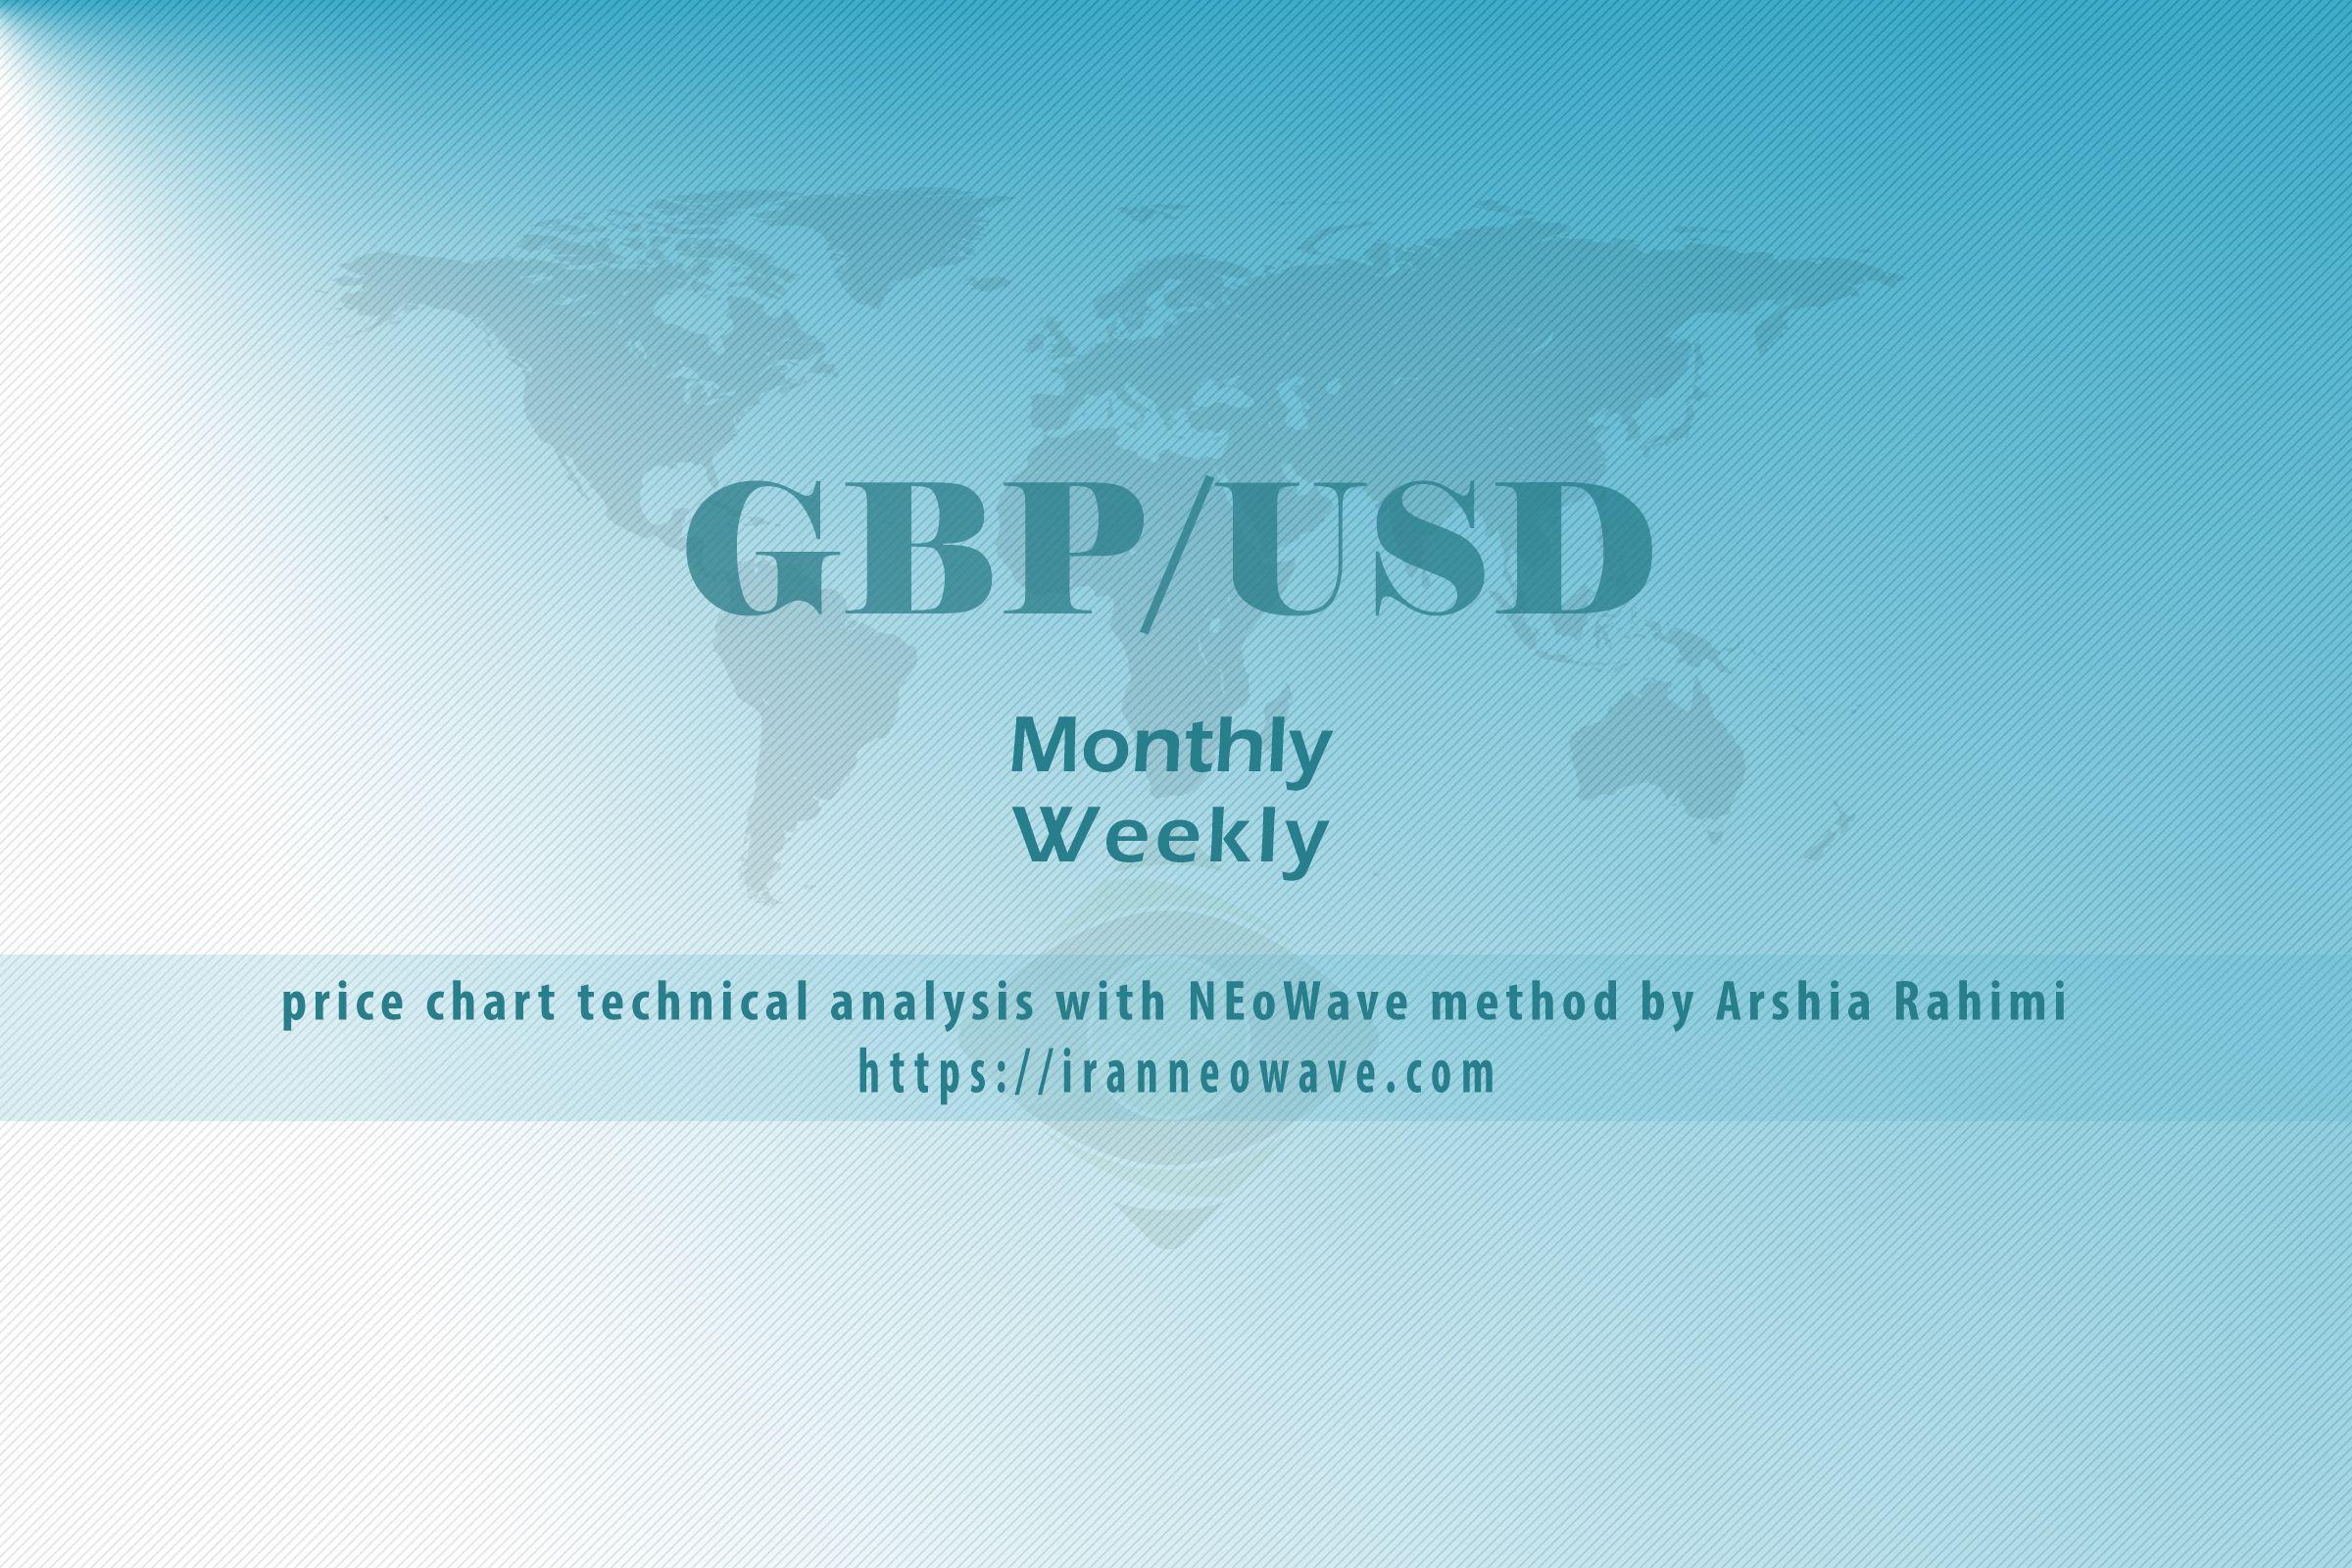 GBPUSD-NeoWave-Analysis-01